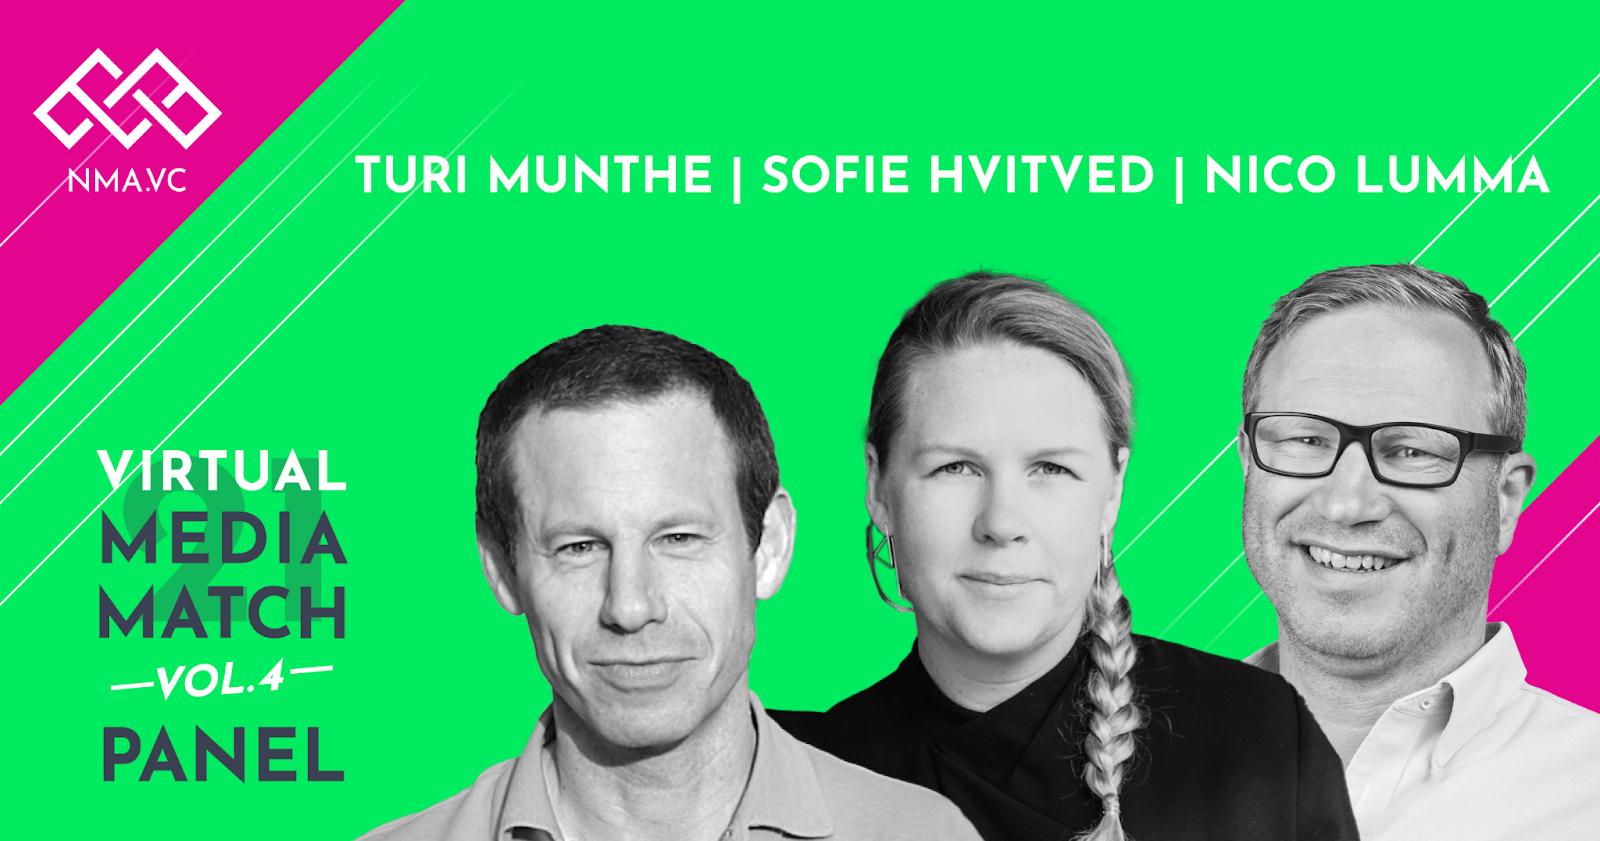 The panelists Turi Munthe, Sofie Hvitved and Moderator Nico Lumma.